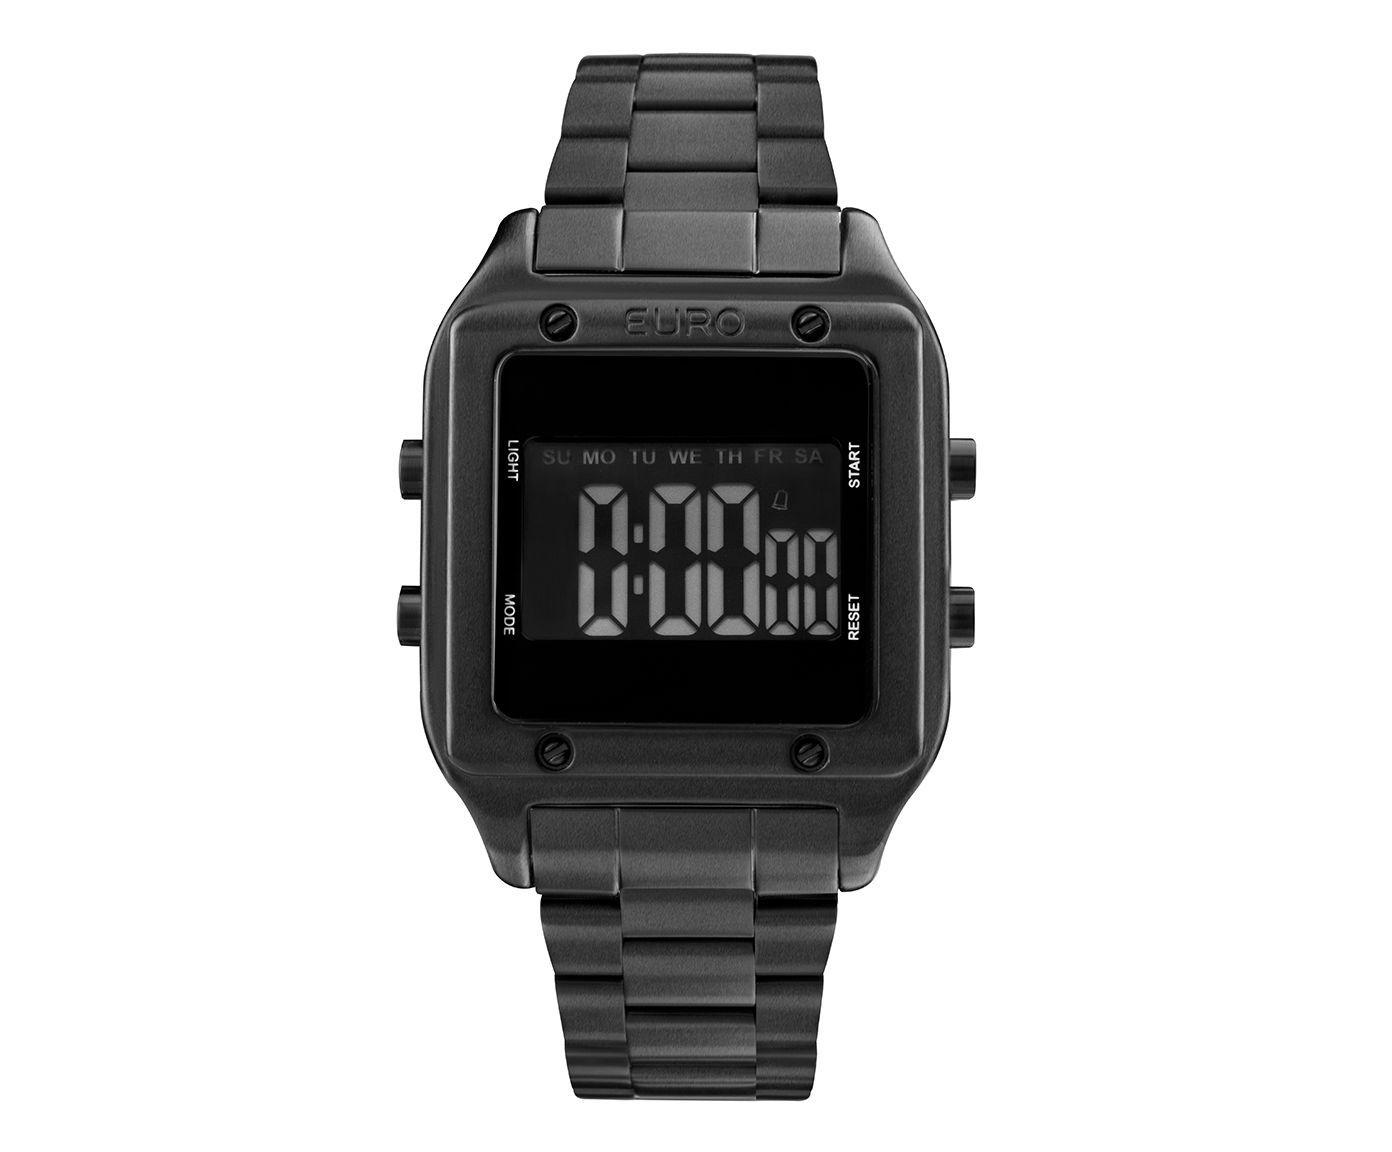 Relógio Fashion Fit Euro Preto | Westwing.com.br